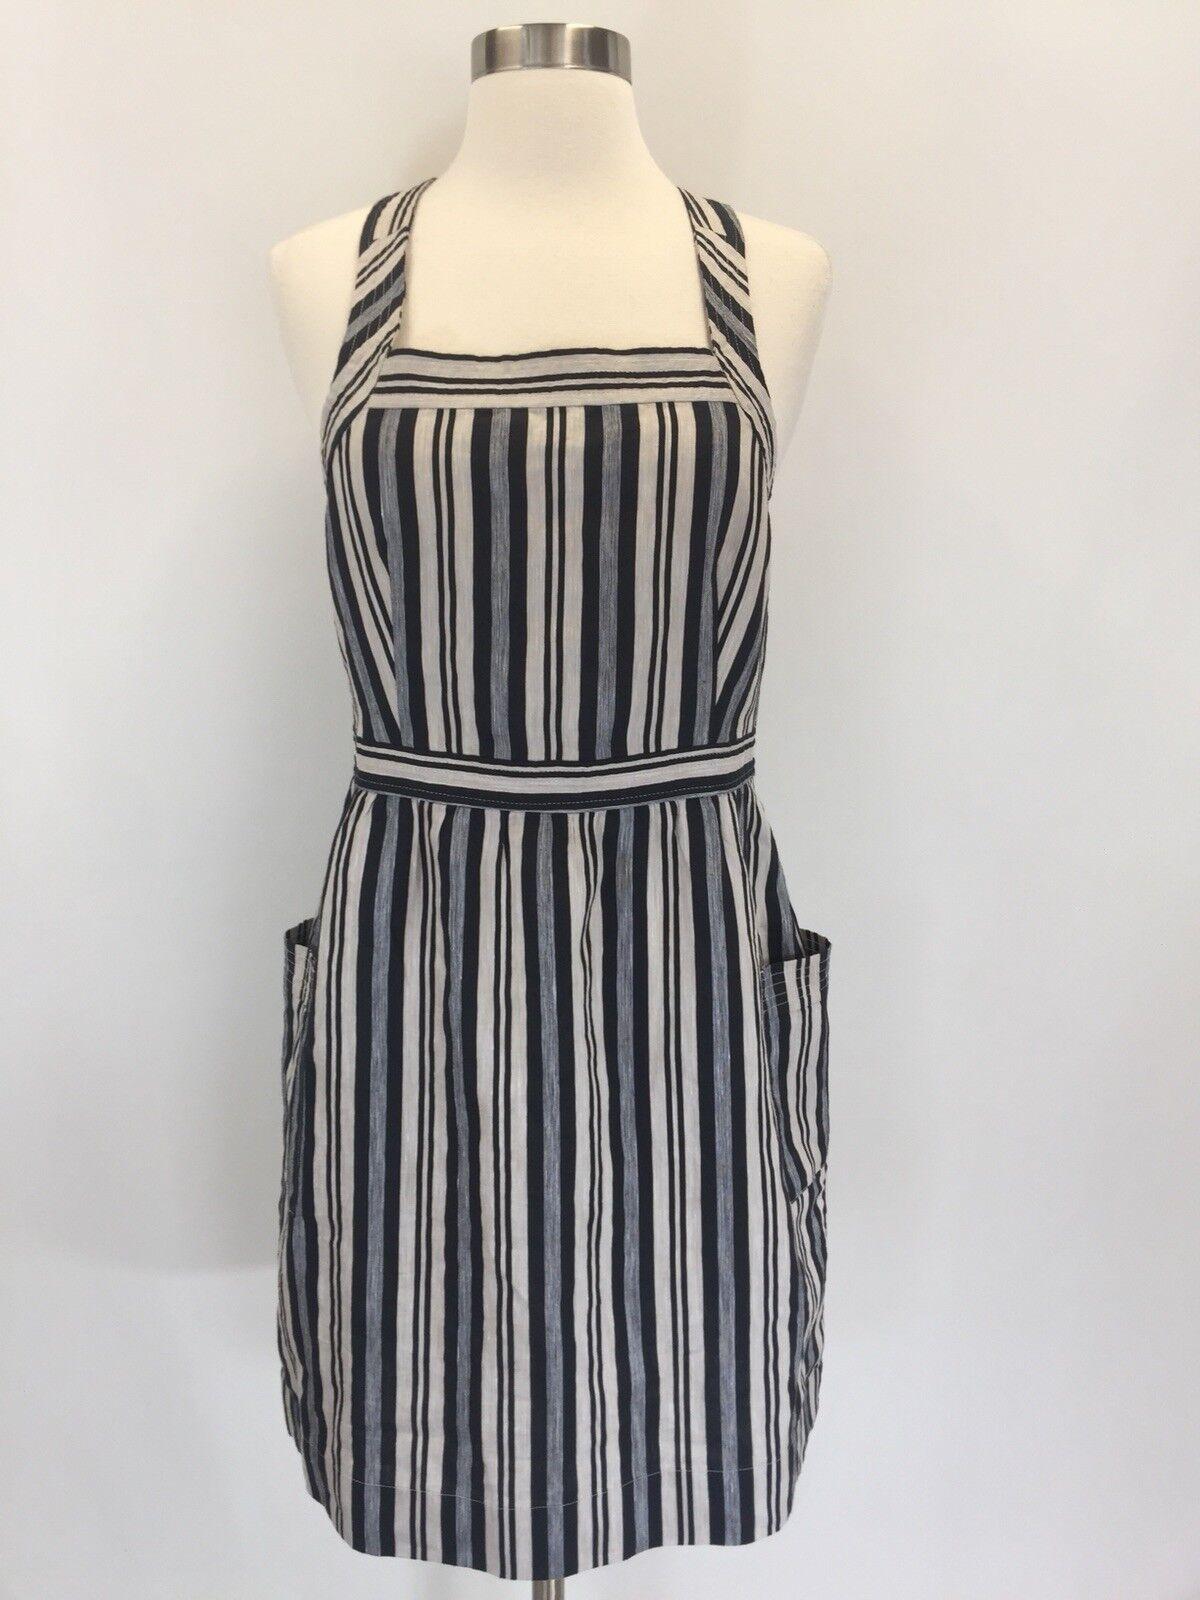 New Madewell Apron Mini Dress in Evelyn Stripe Stone Sz 8 J3711